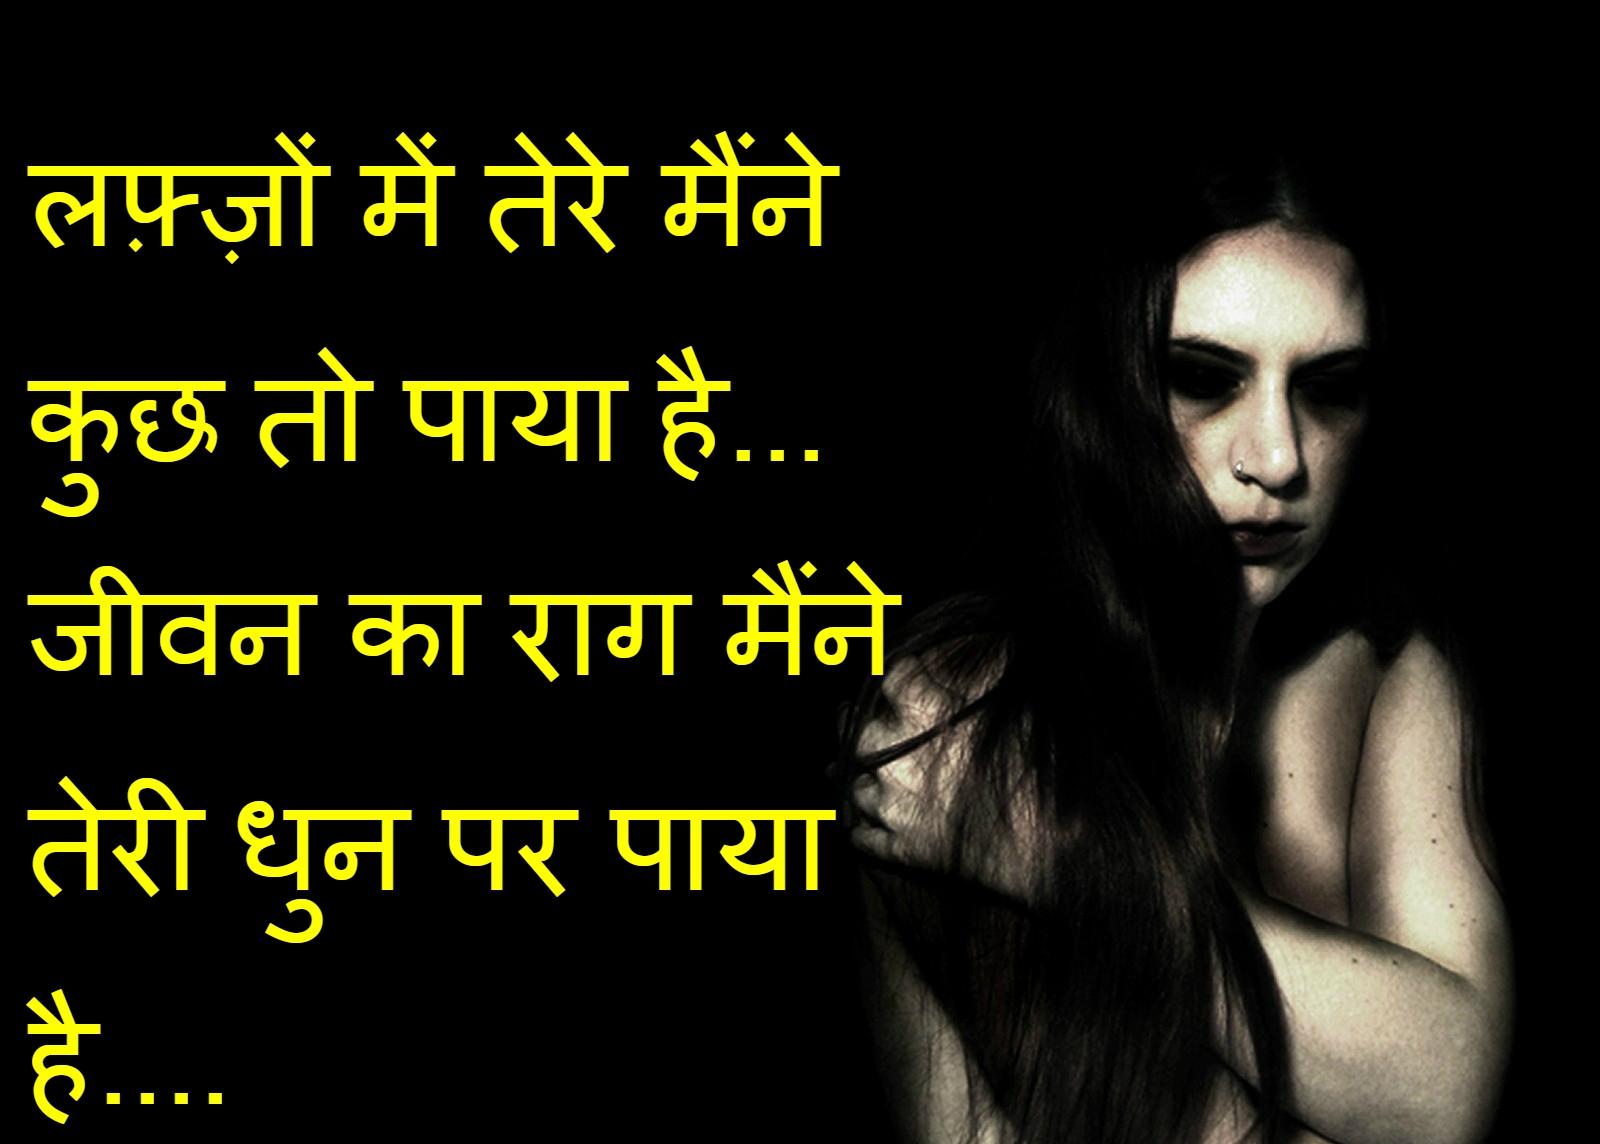 Shayari Hi Shayari: New ,Hindi Shayari Image,Hindi Love Shayari SMS ...